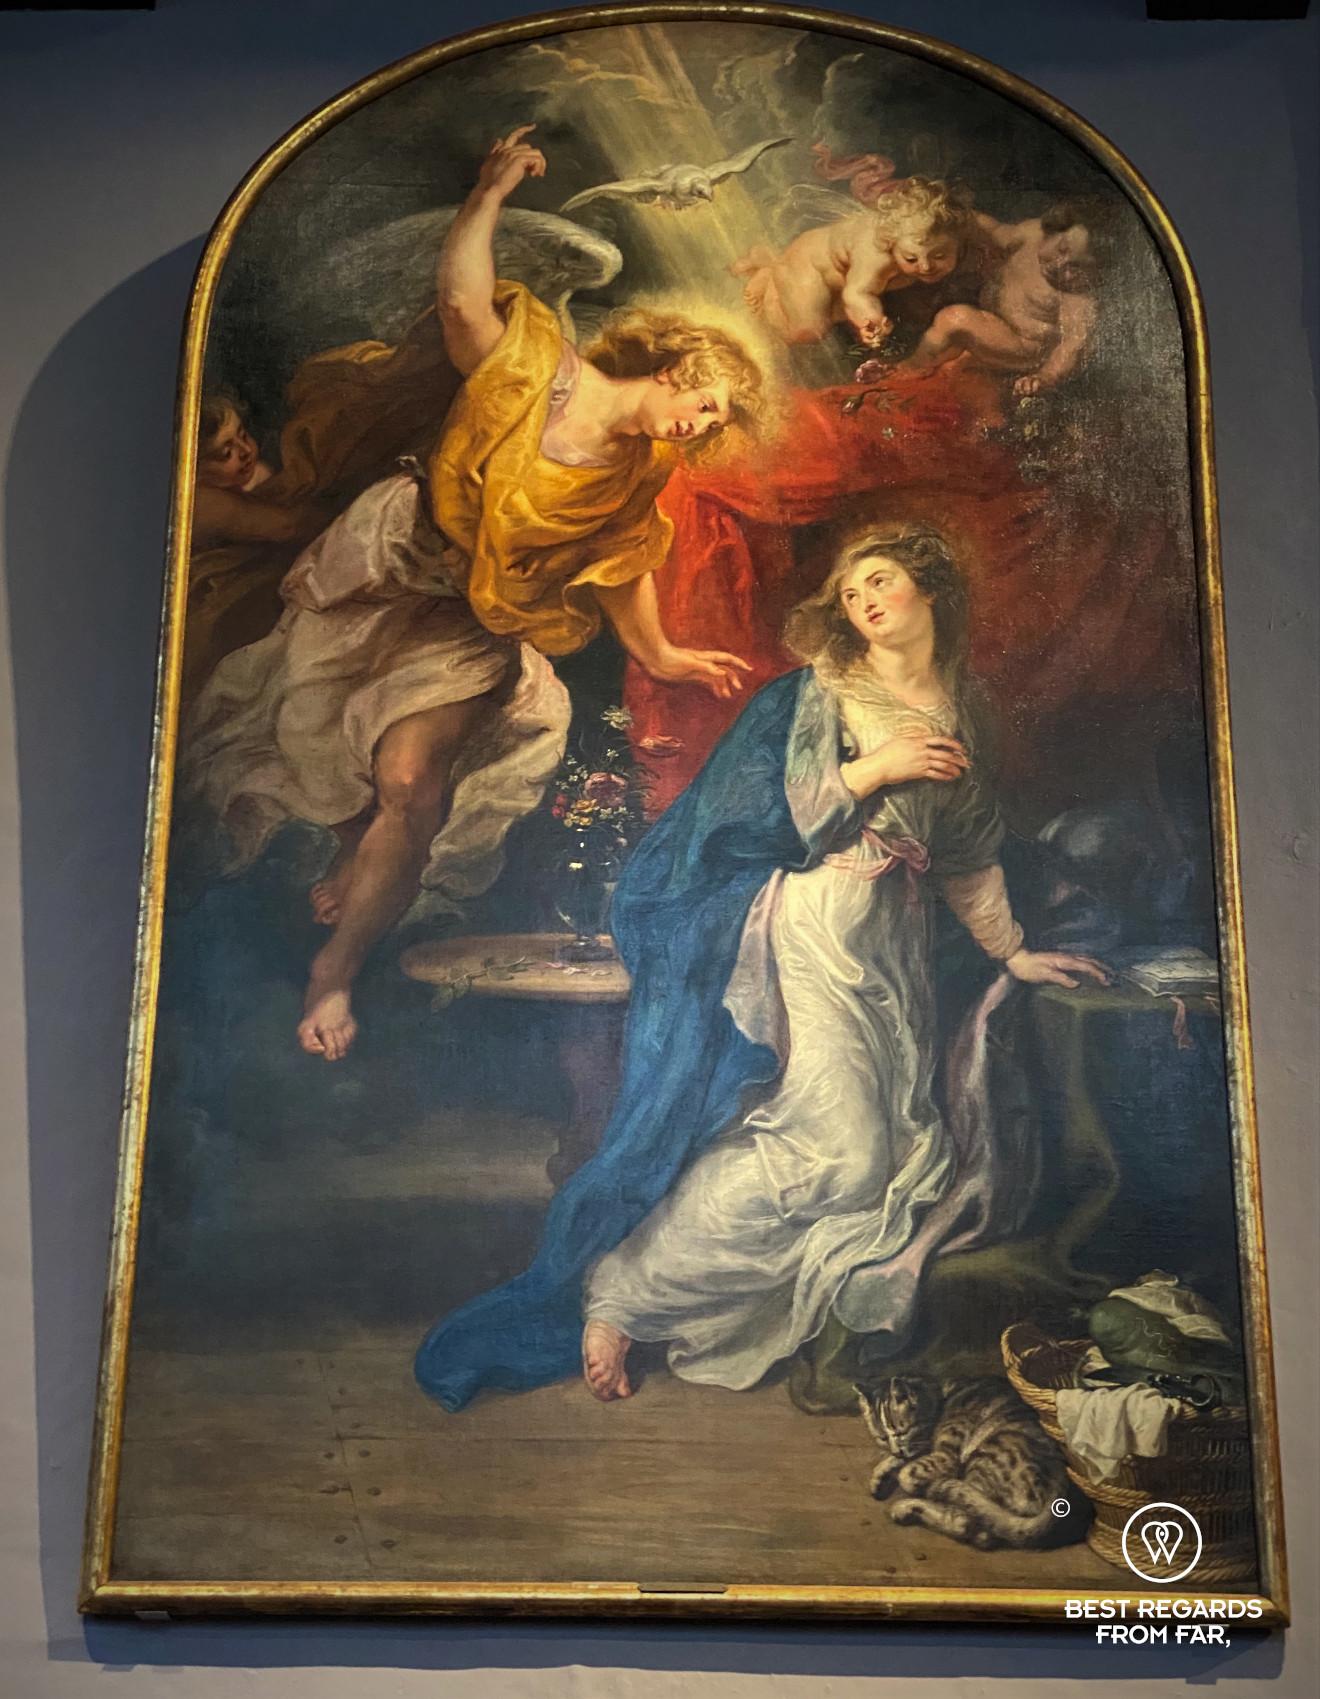 The Annunciation by Rubens, Rubens' House, Antwerp